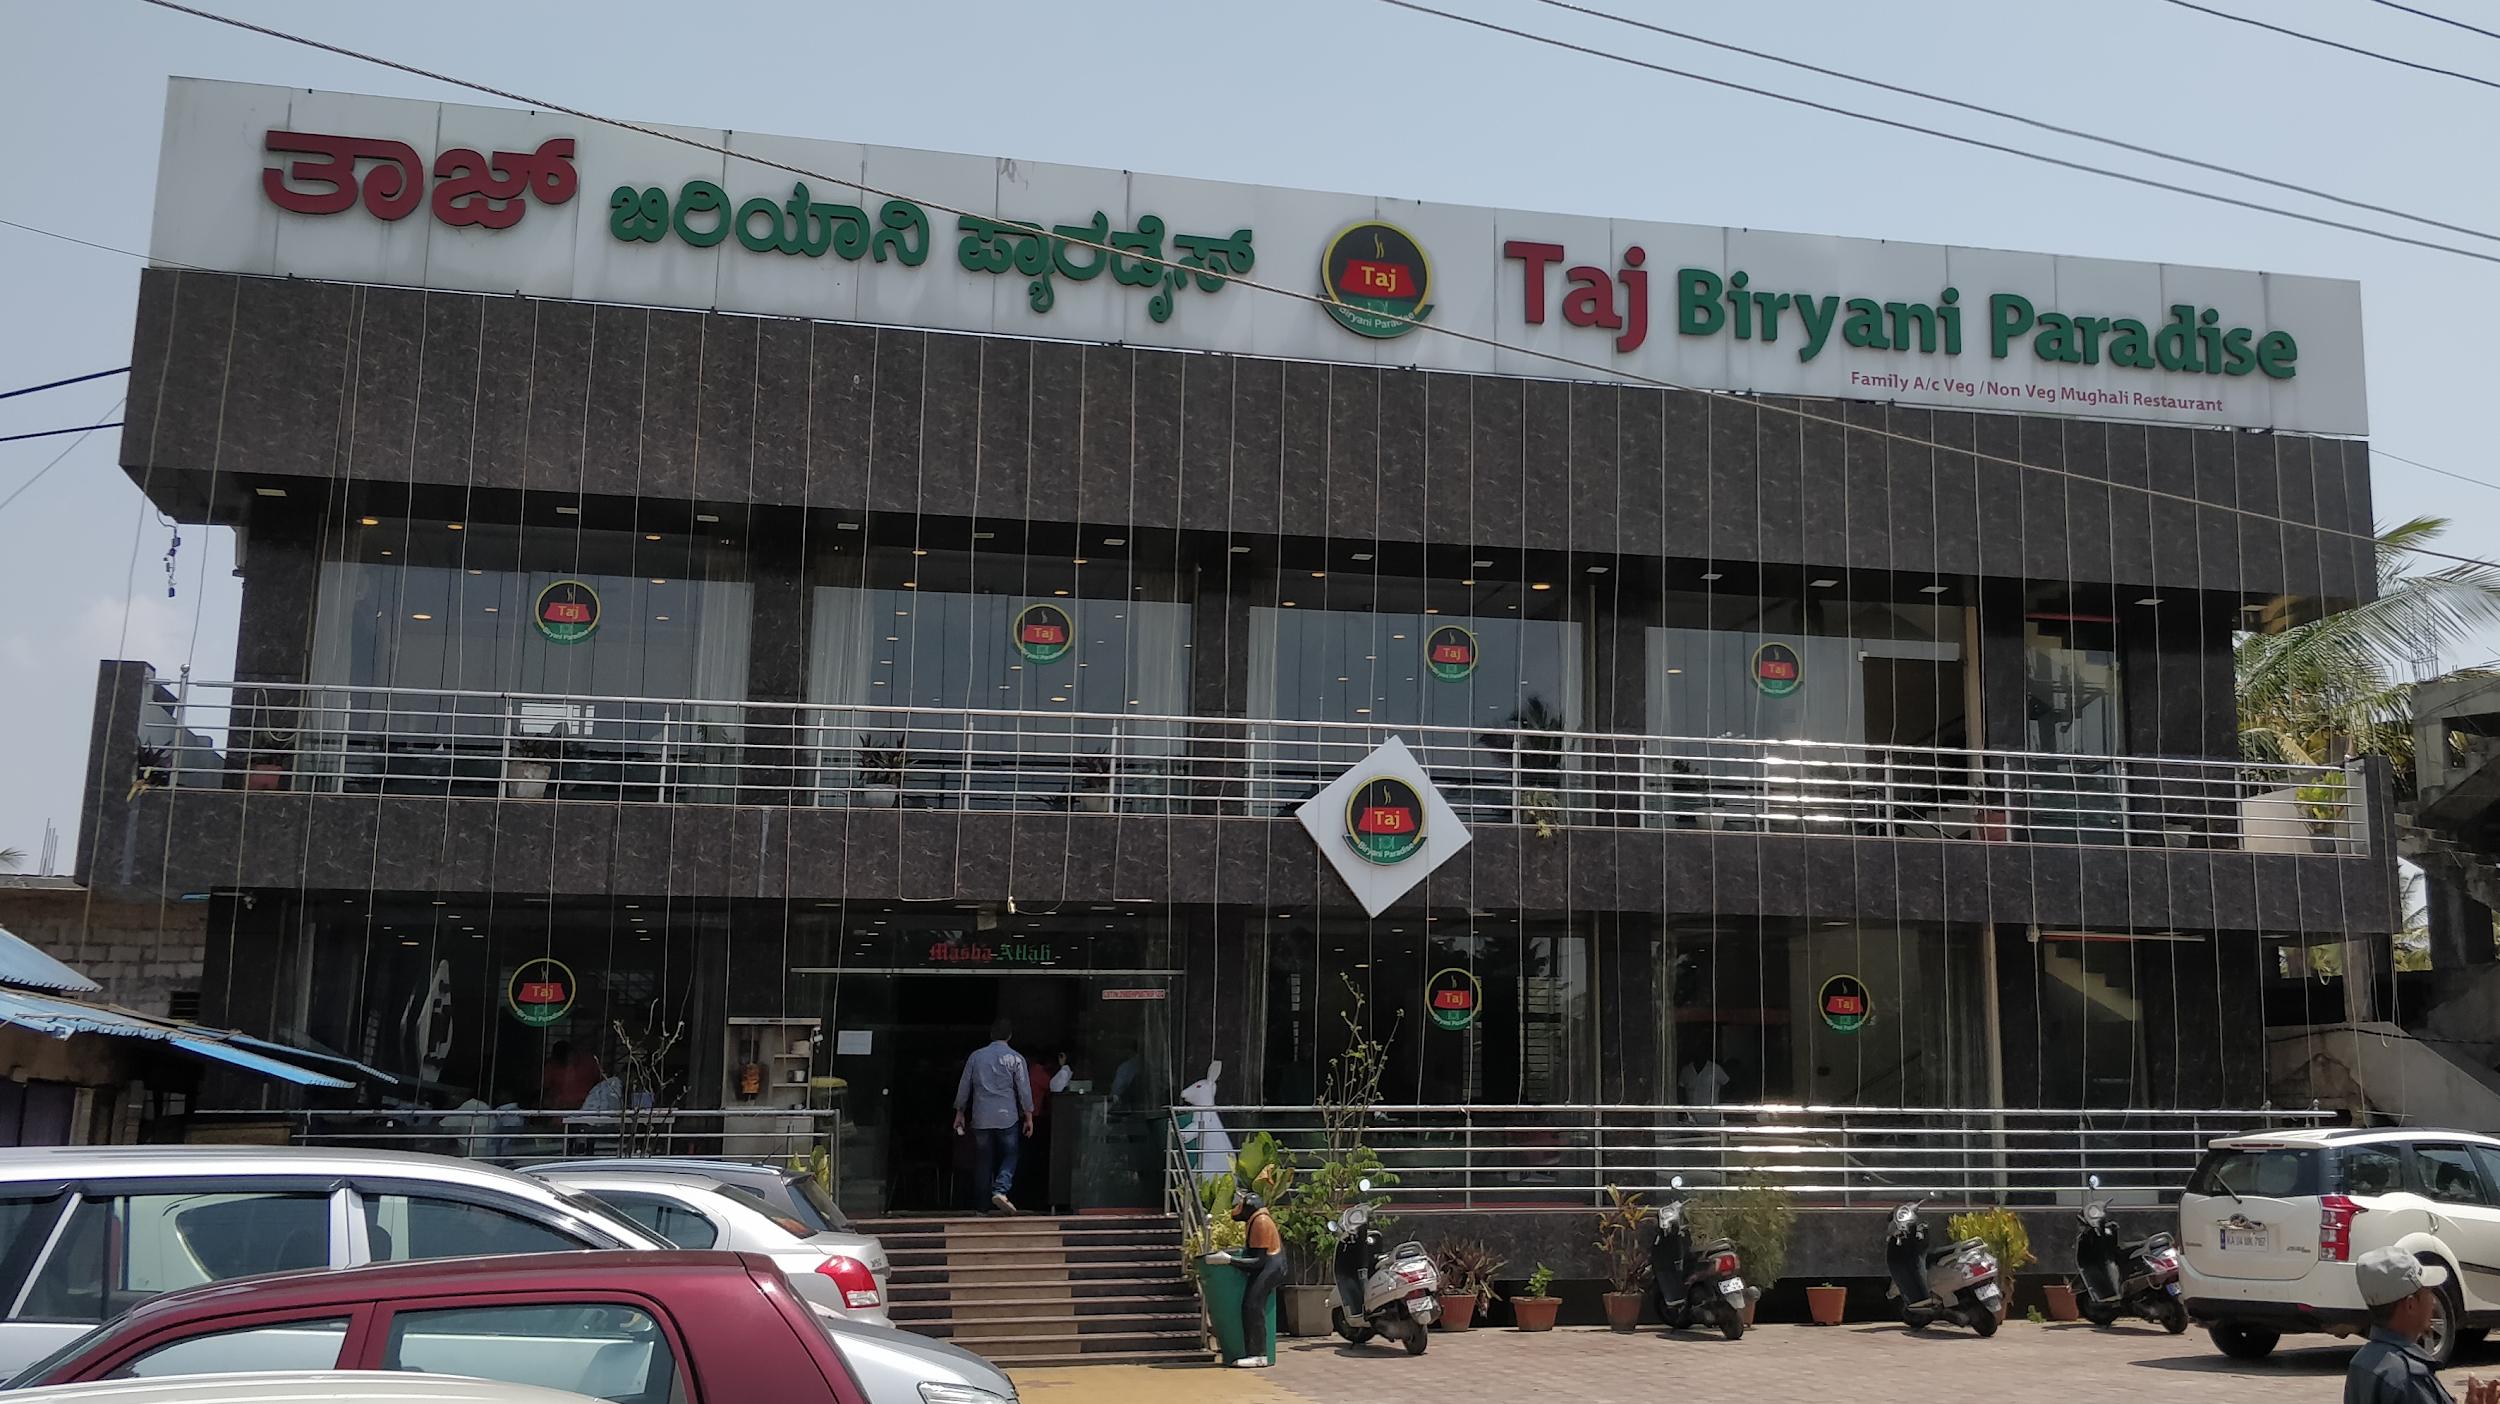 Taj Briyani Paradise Ramanagra